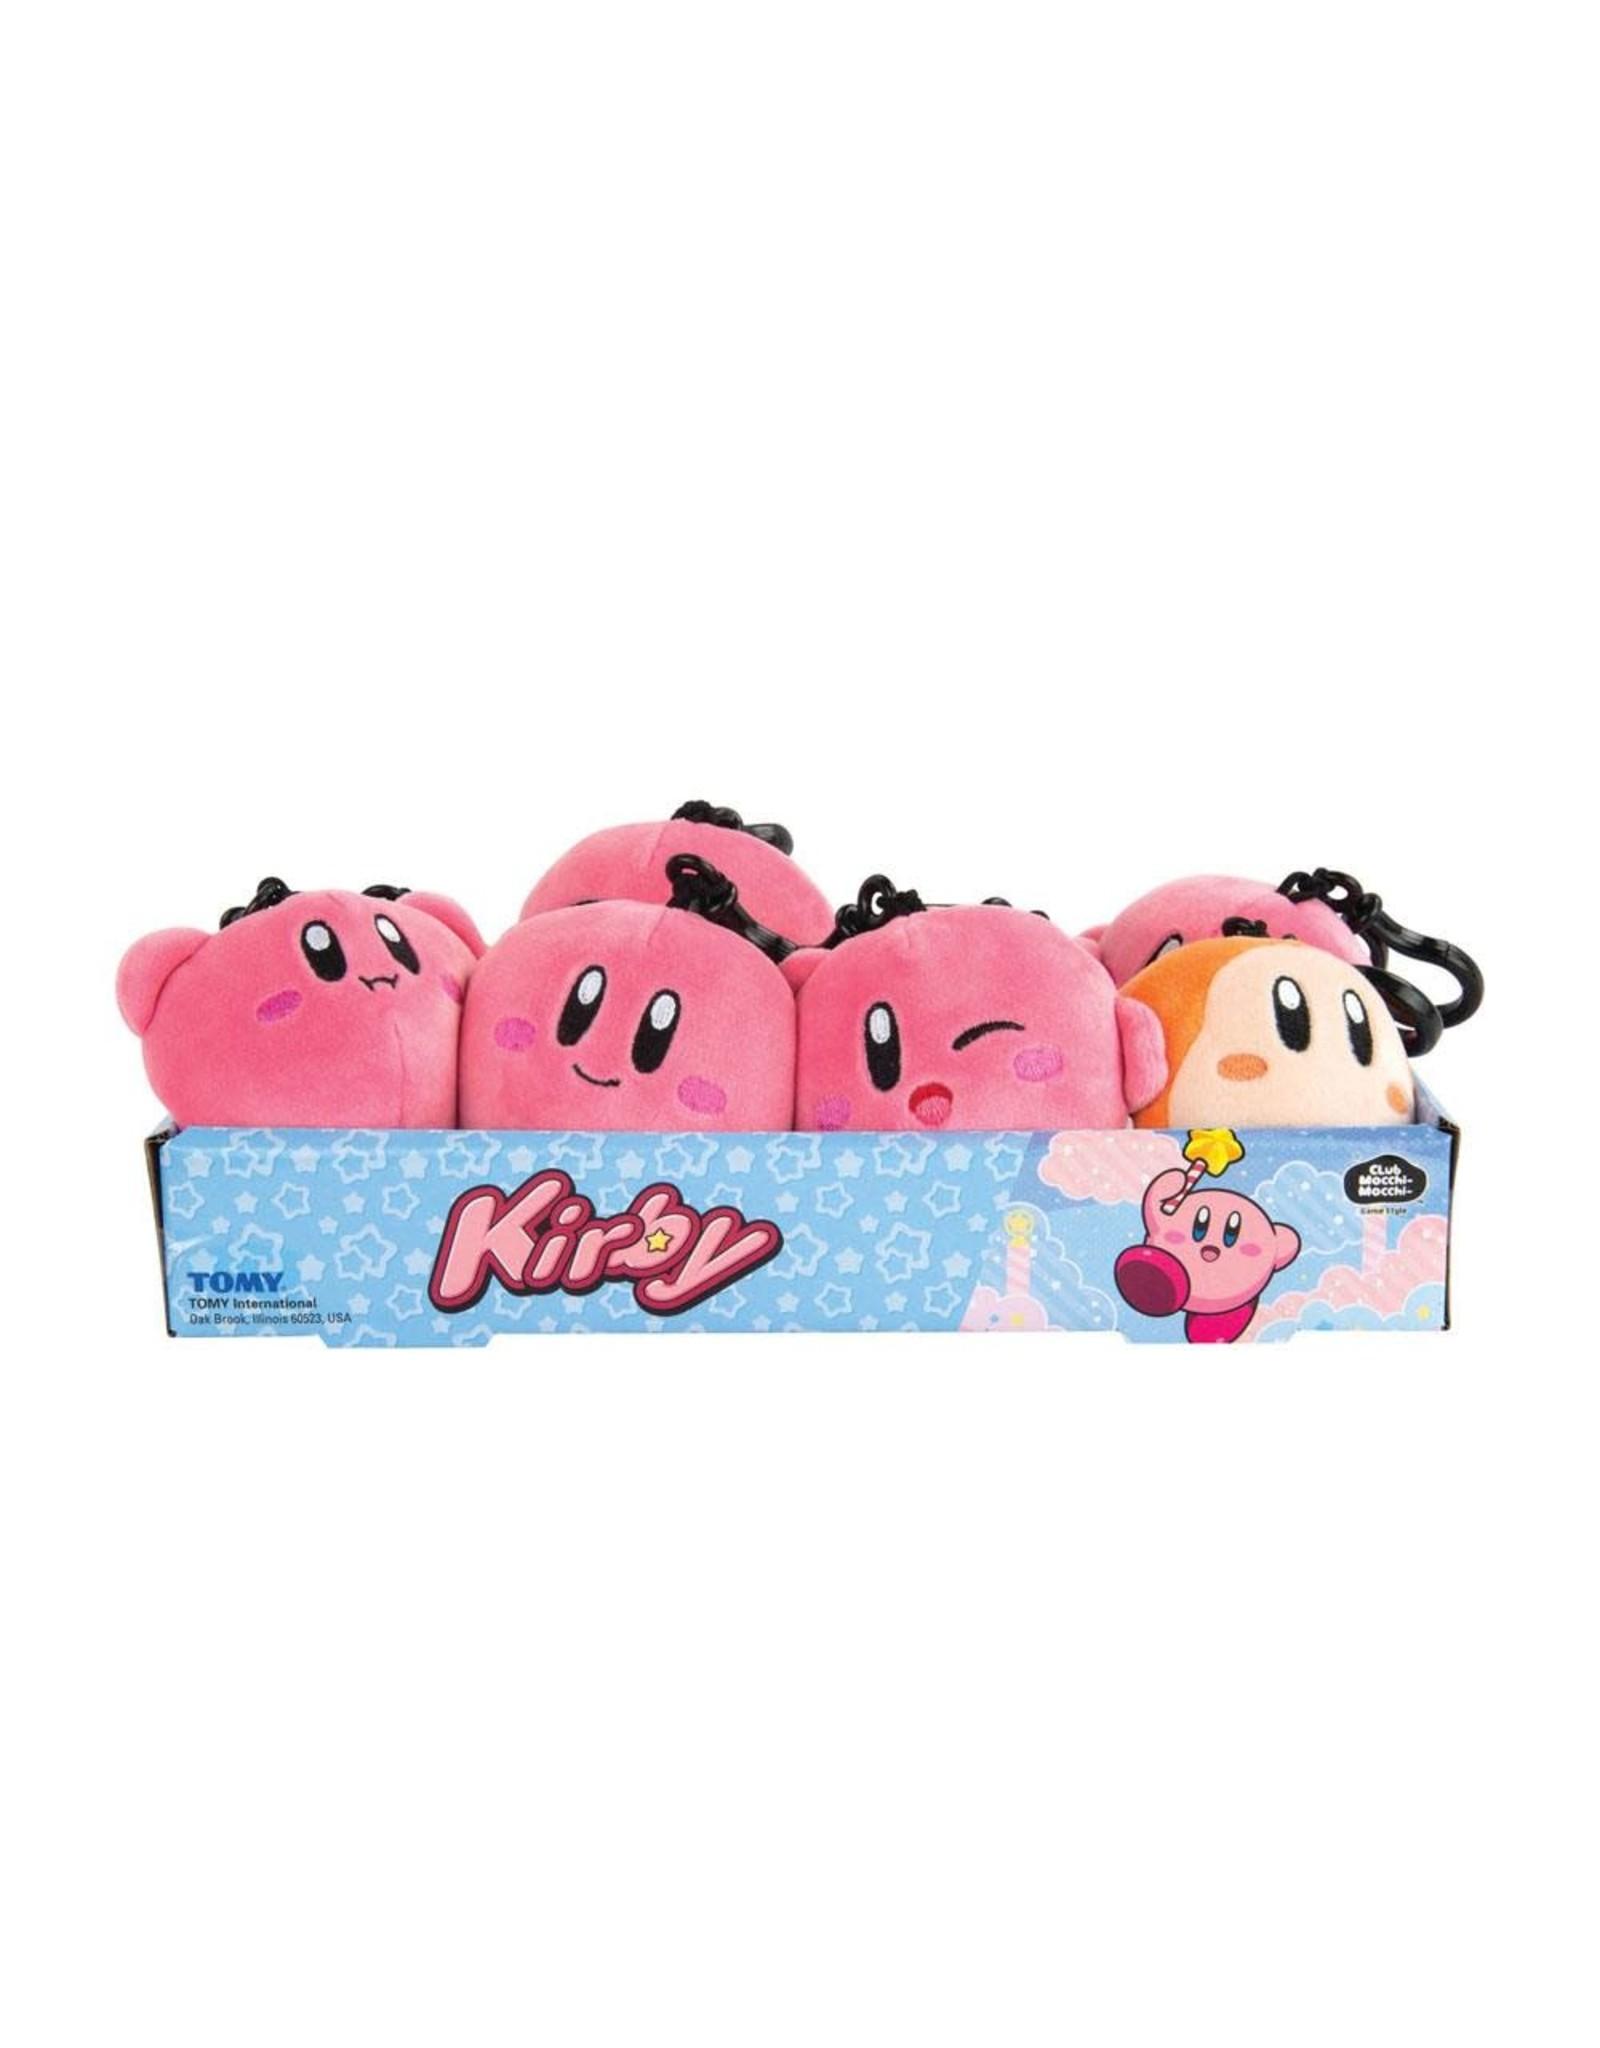 Kirby Mocchi-Mocchi Clip-On Plush Hanger (random) - 10 cm